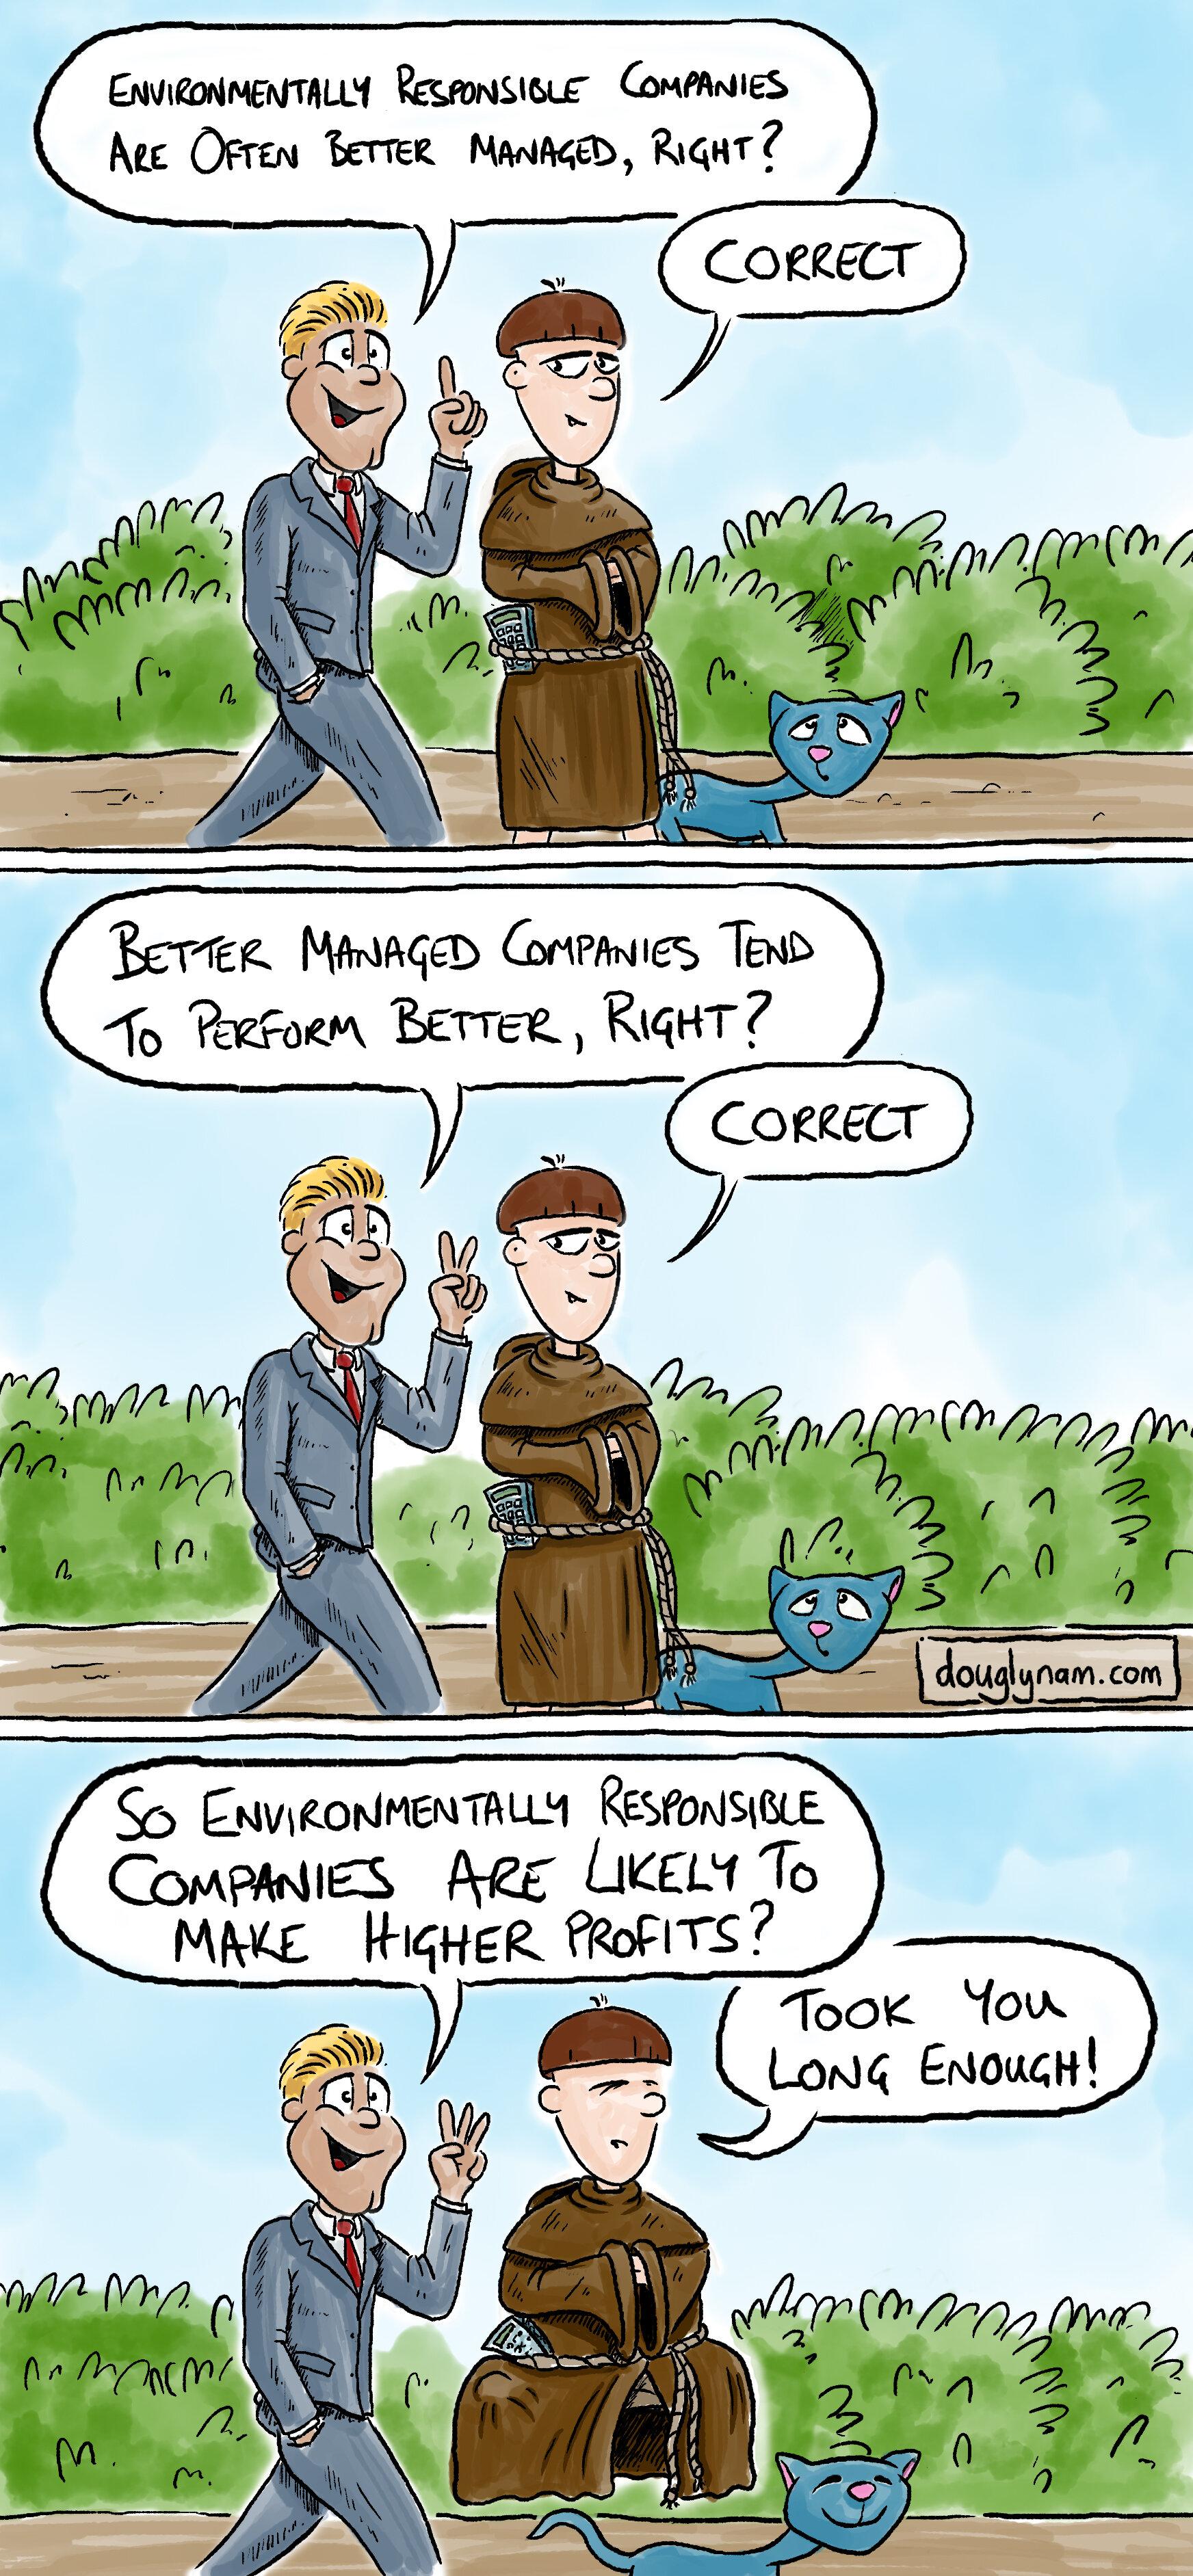 12_EnvironmentallyResponsibleCompanies_3 (2).jpg